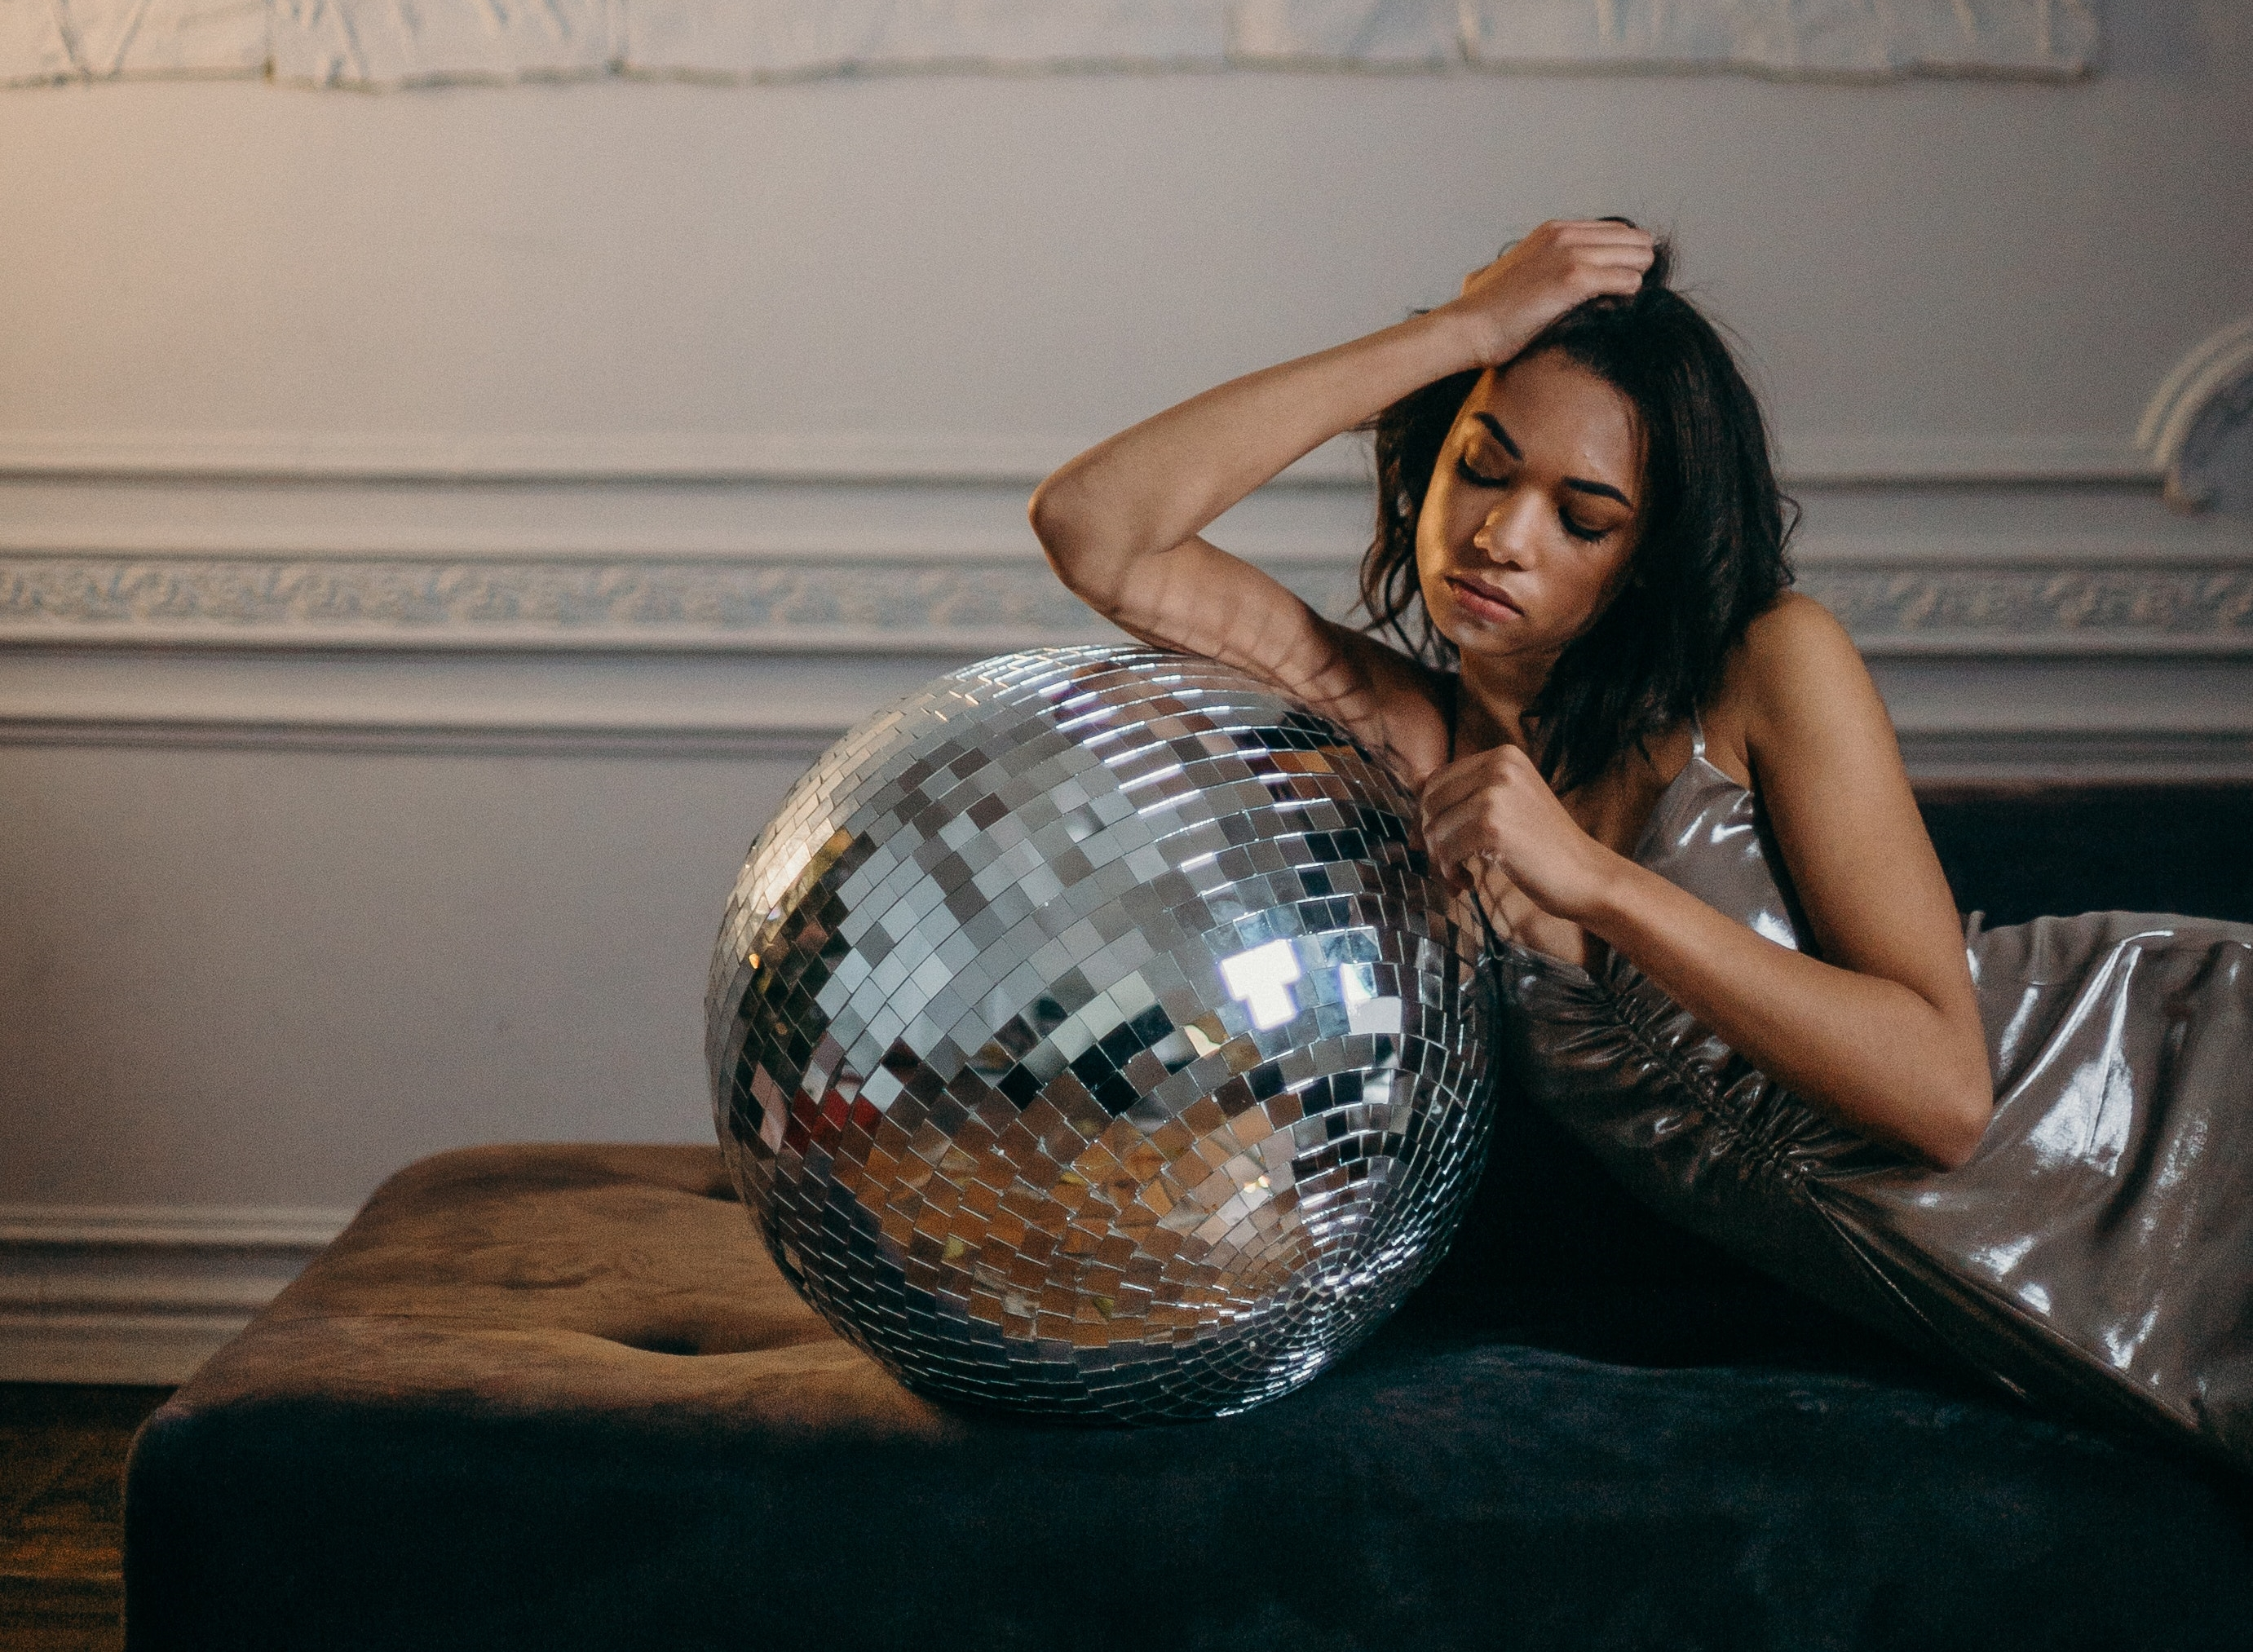 photo-of-woman-leaning-on-disco-ball-3402579b.jpg